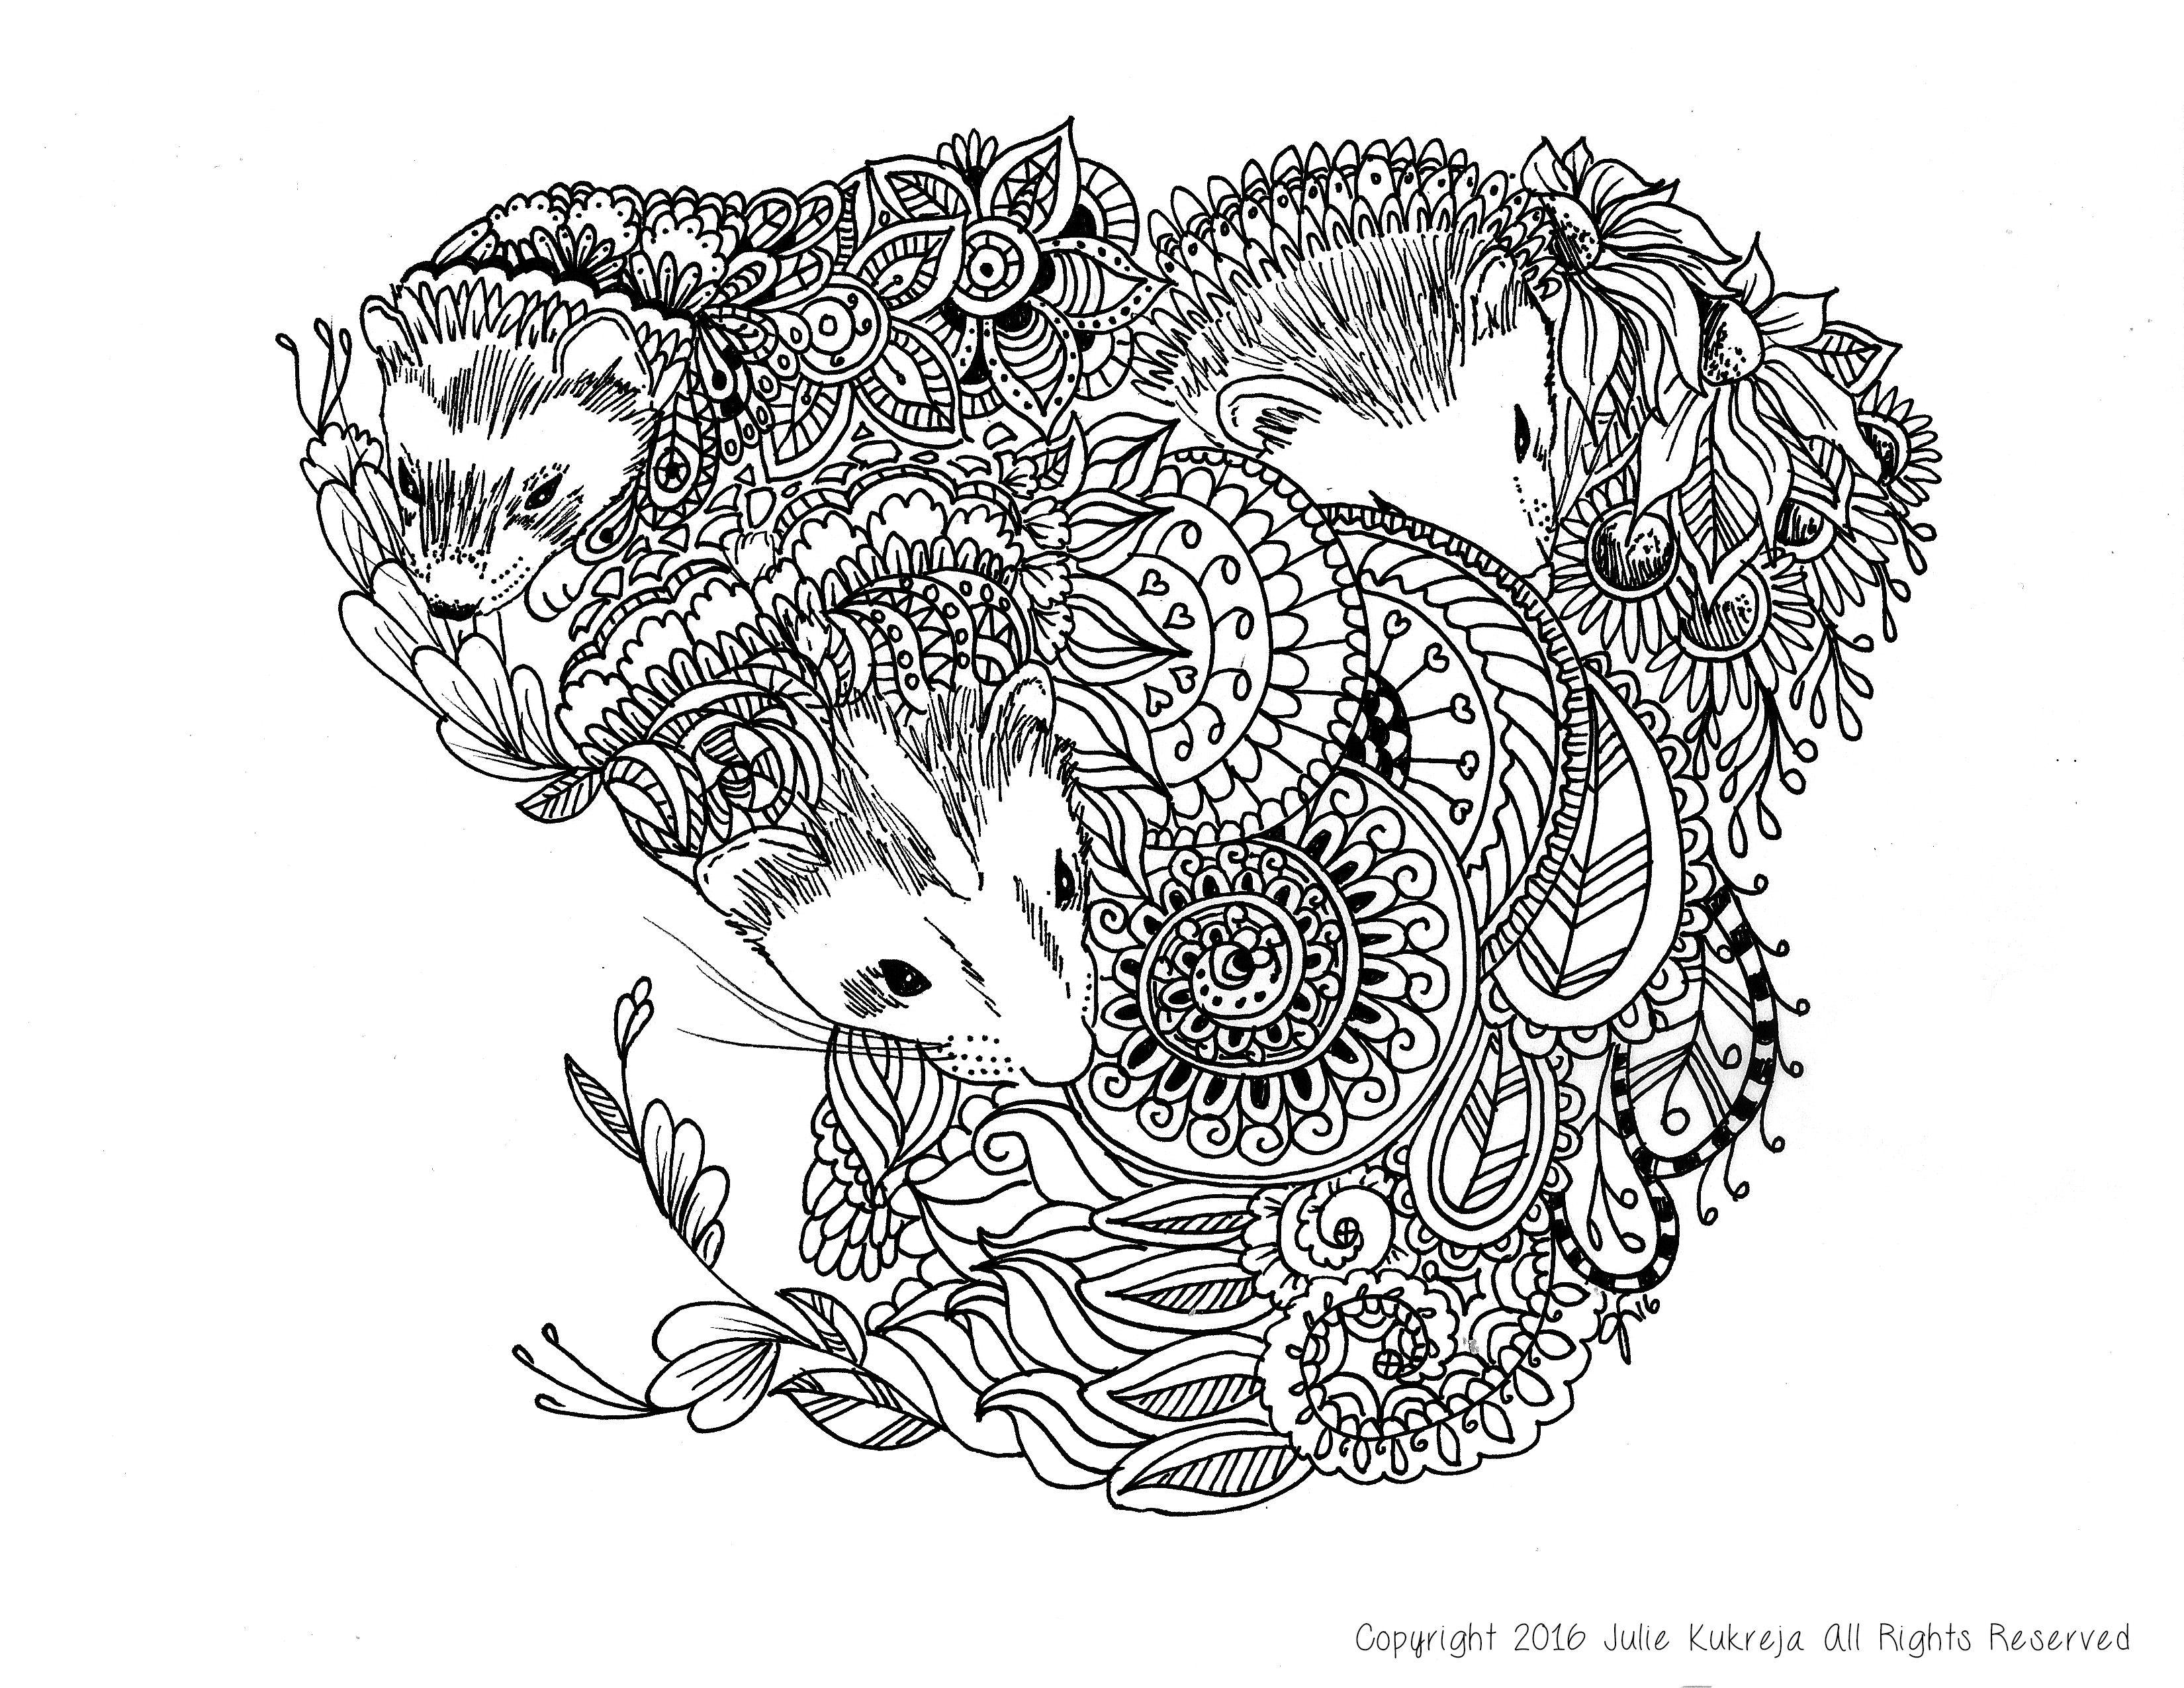 Custom Pet Portrait Coloring Book Page Ferrets By Julie Kukreja